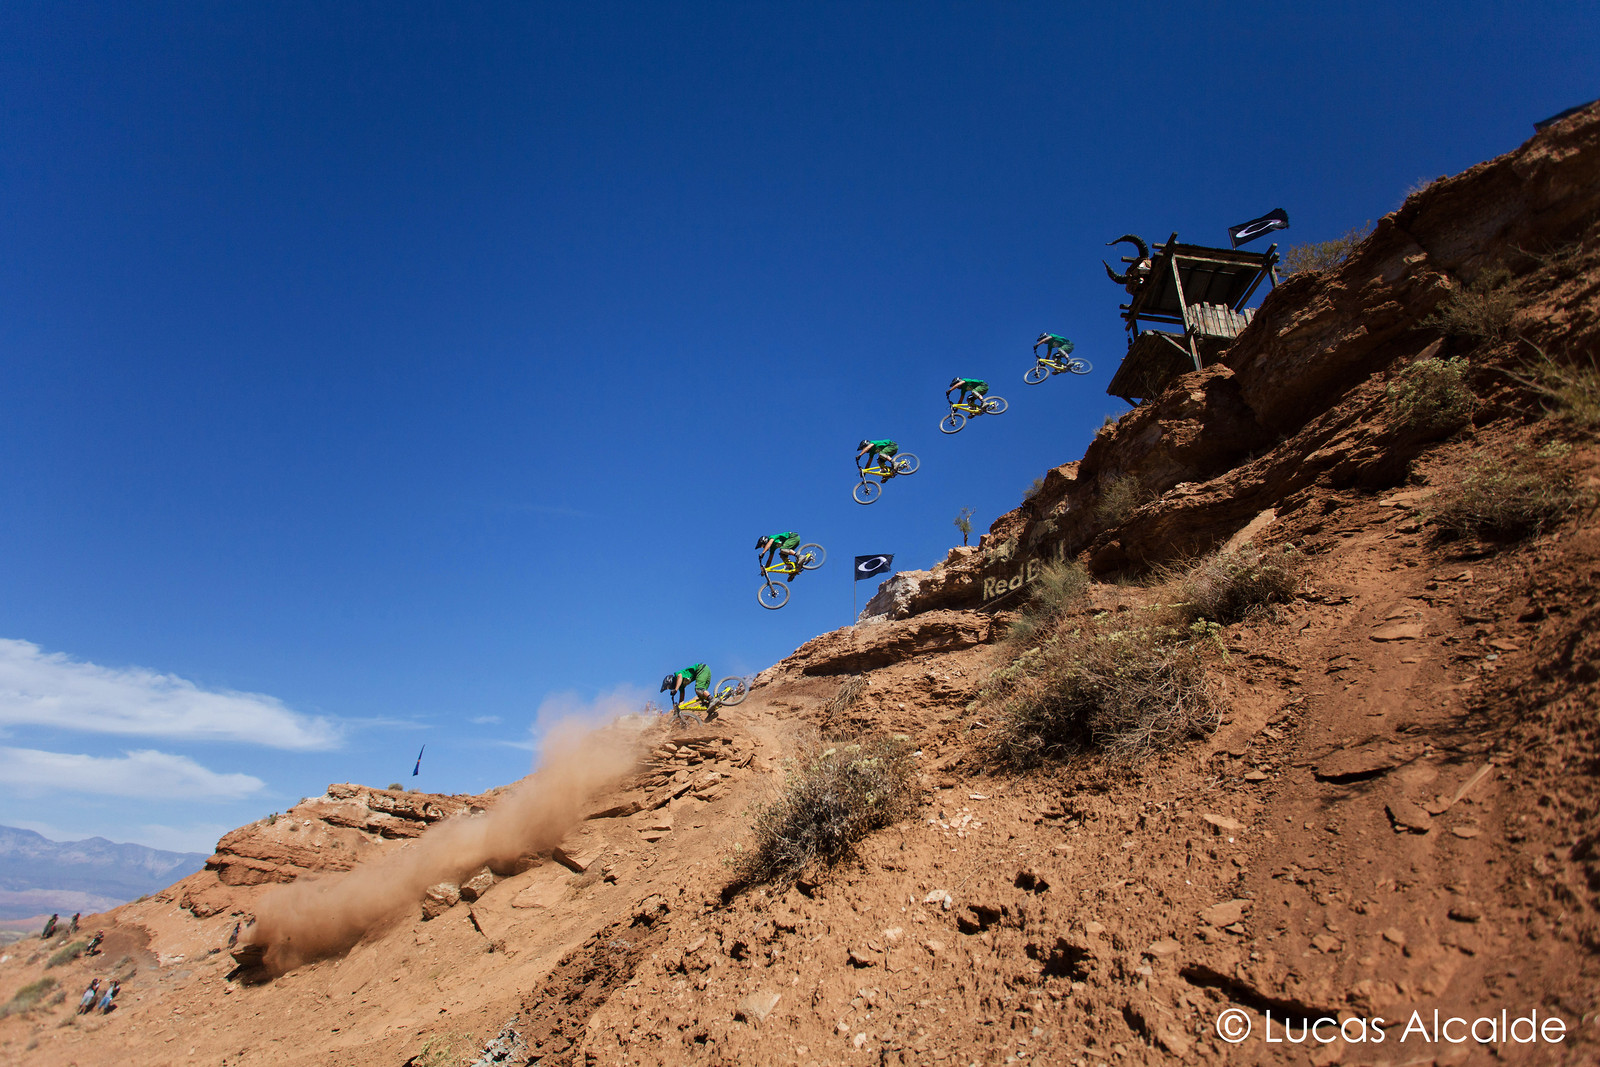 Mike Kinrade went BIG, not home! - Lucas_Alcalde - Mountain Biking Pictures - Vital MTB